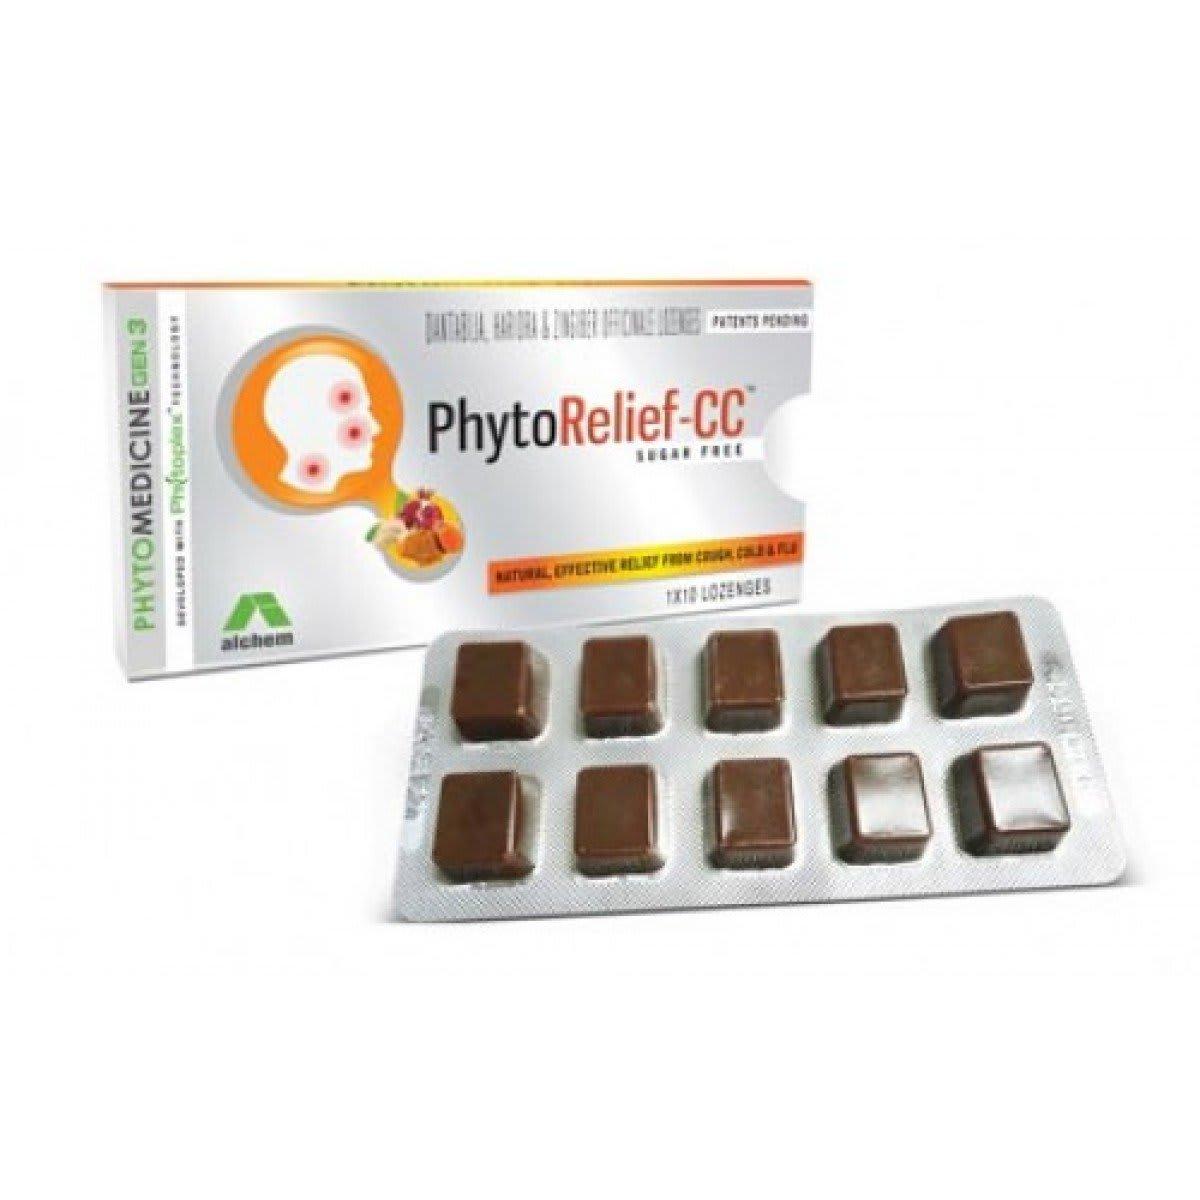 Phytorelief-CC Sugarfree Lozenges